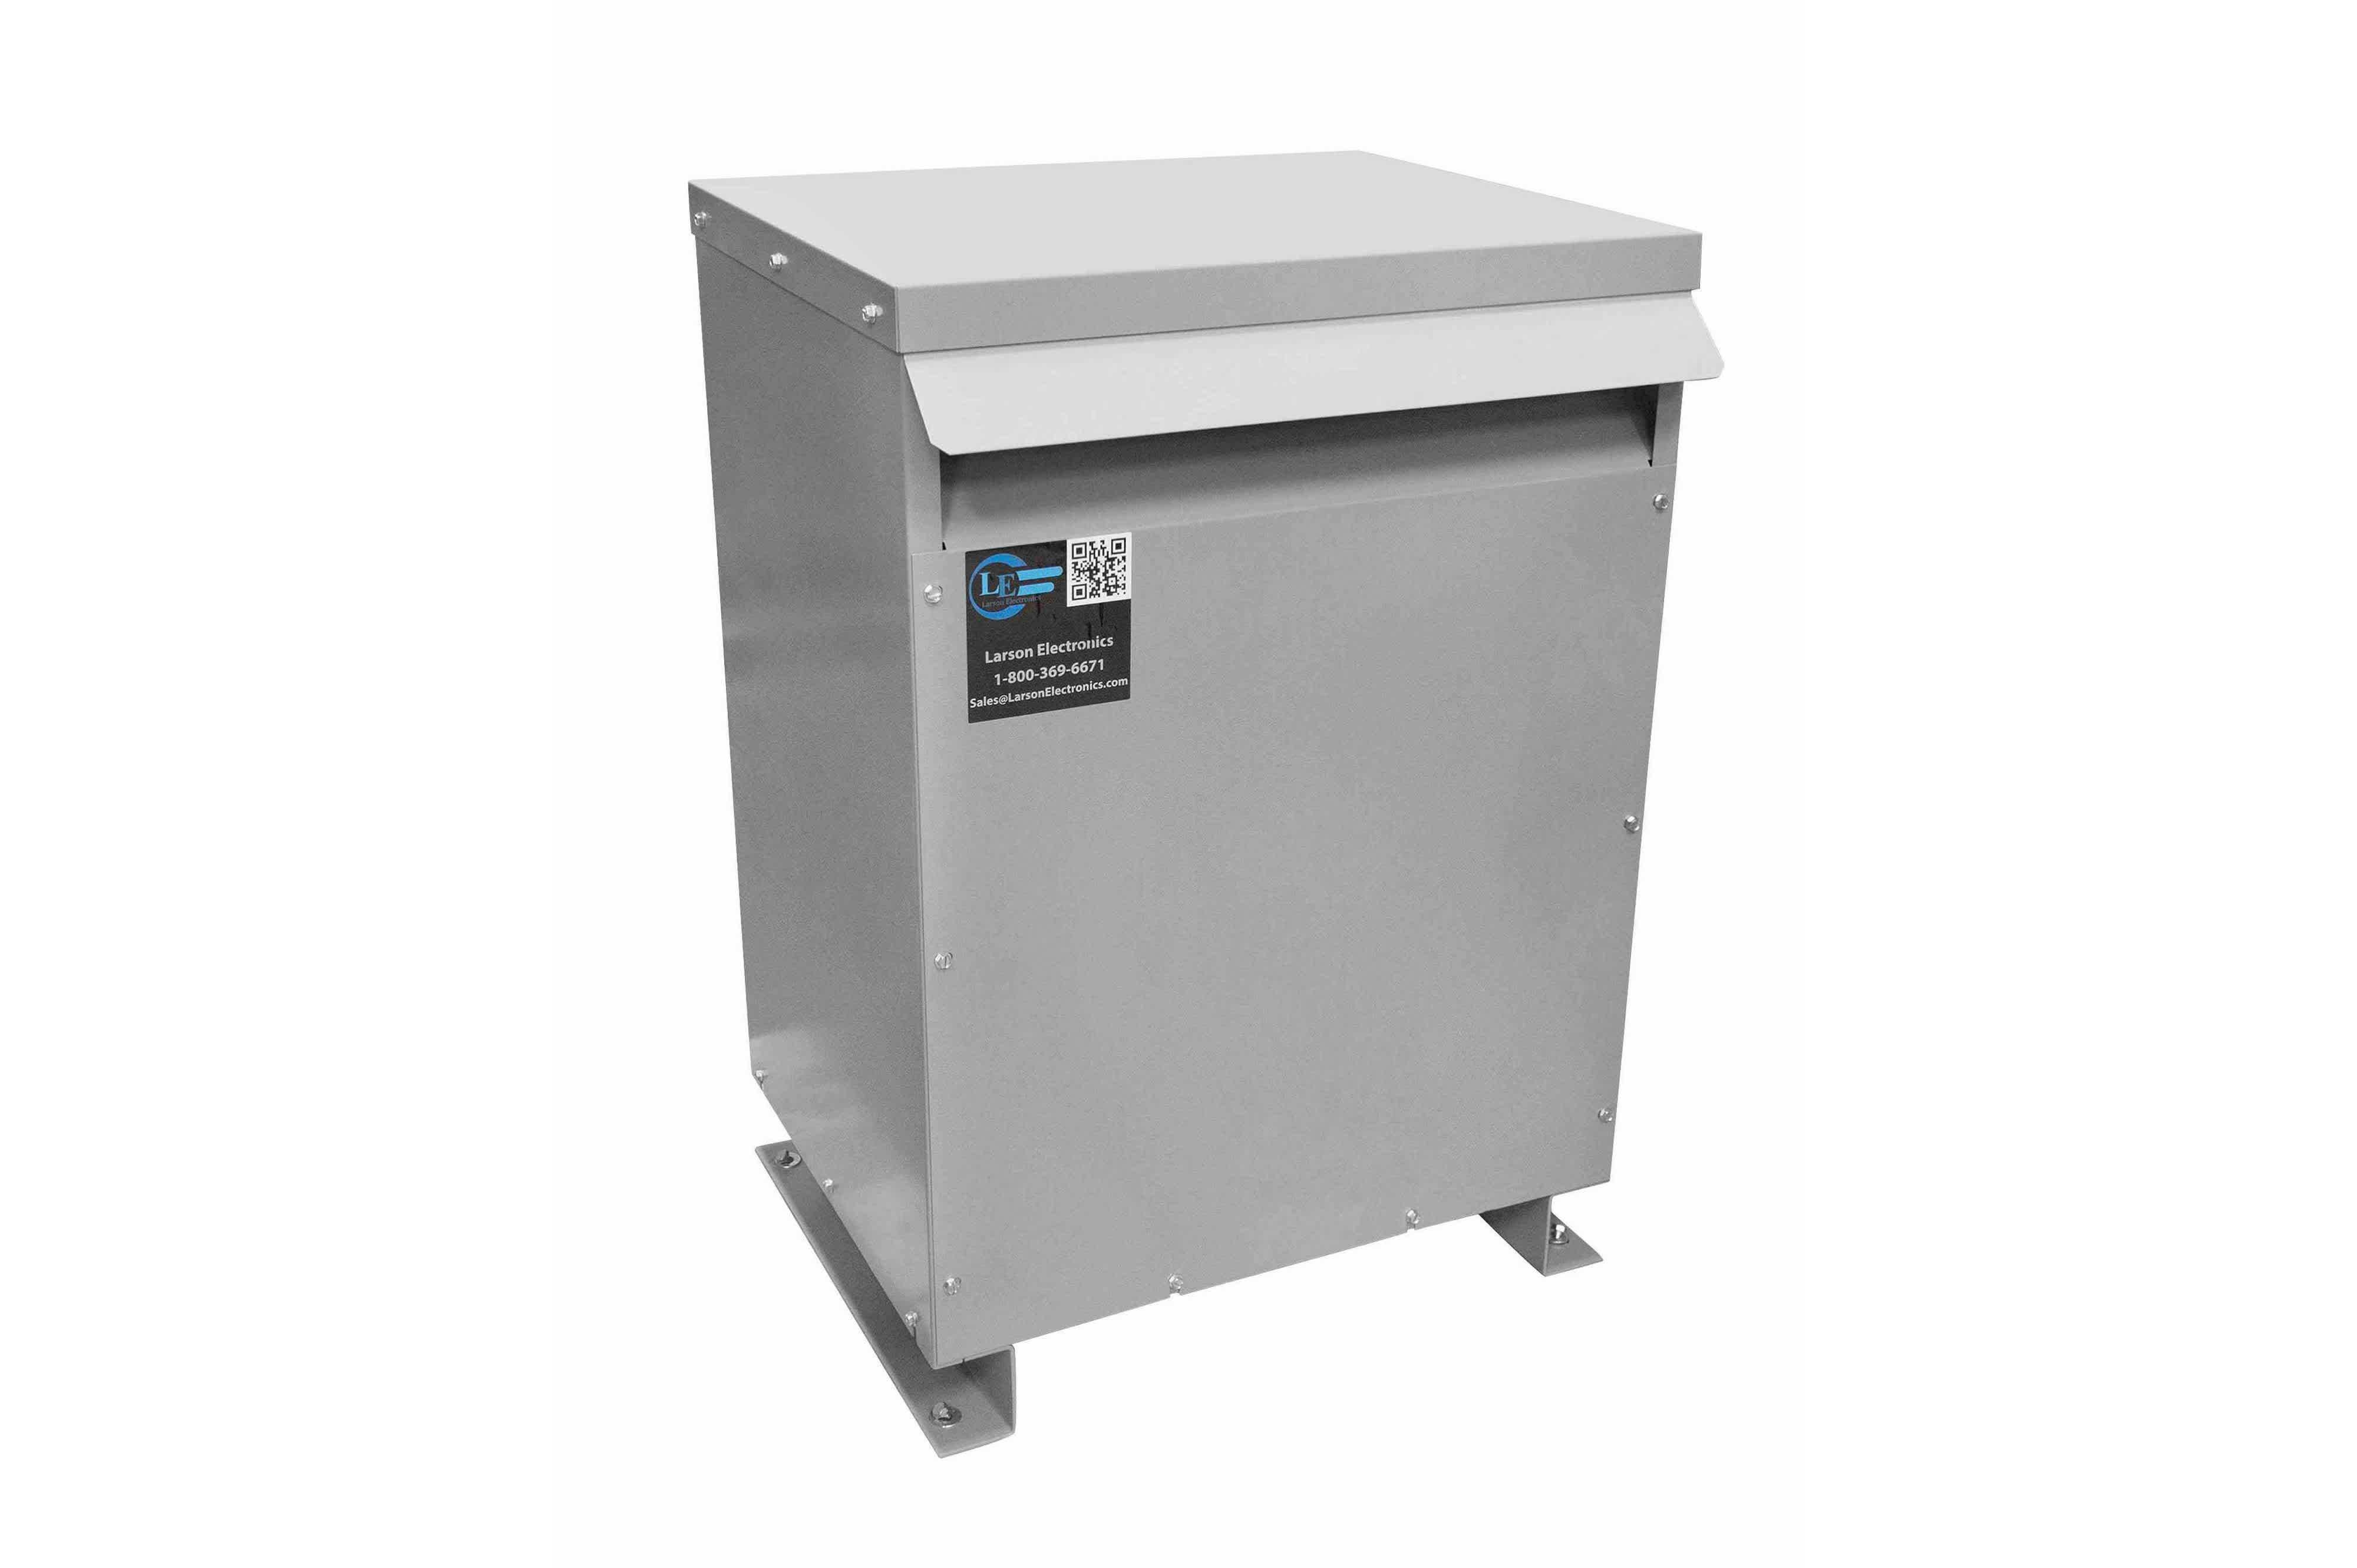 37.5 kVA 3PH Isolation Transformer, 460V Wye Primary, 415Y/240 Wye-N Secondary, N3R, Ventilated, 60 Hz